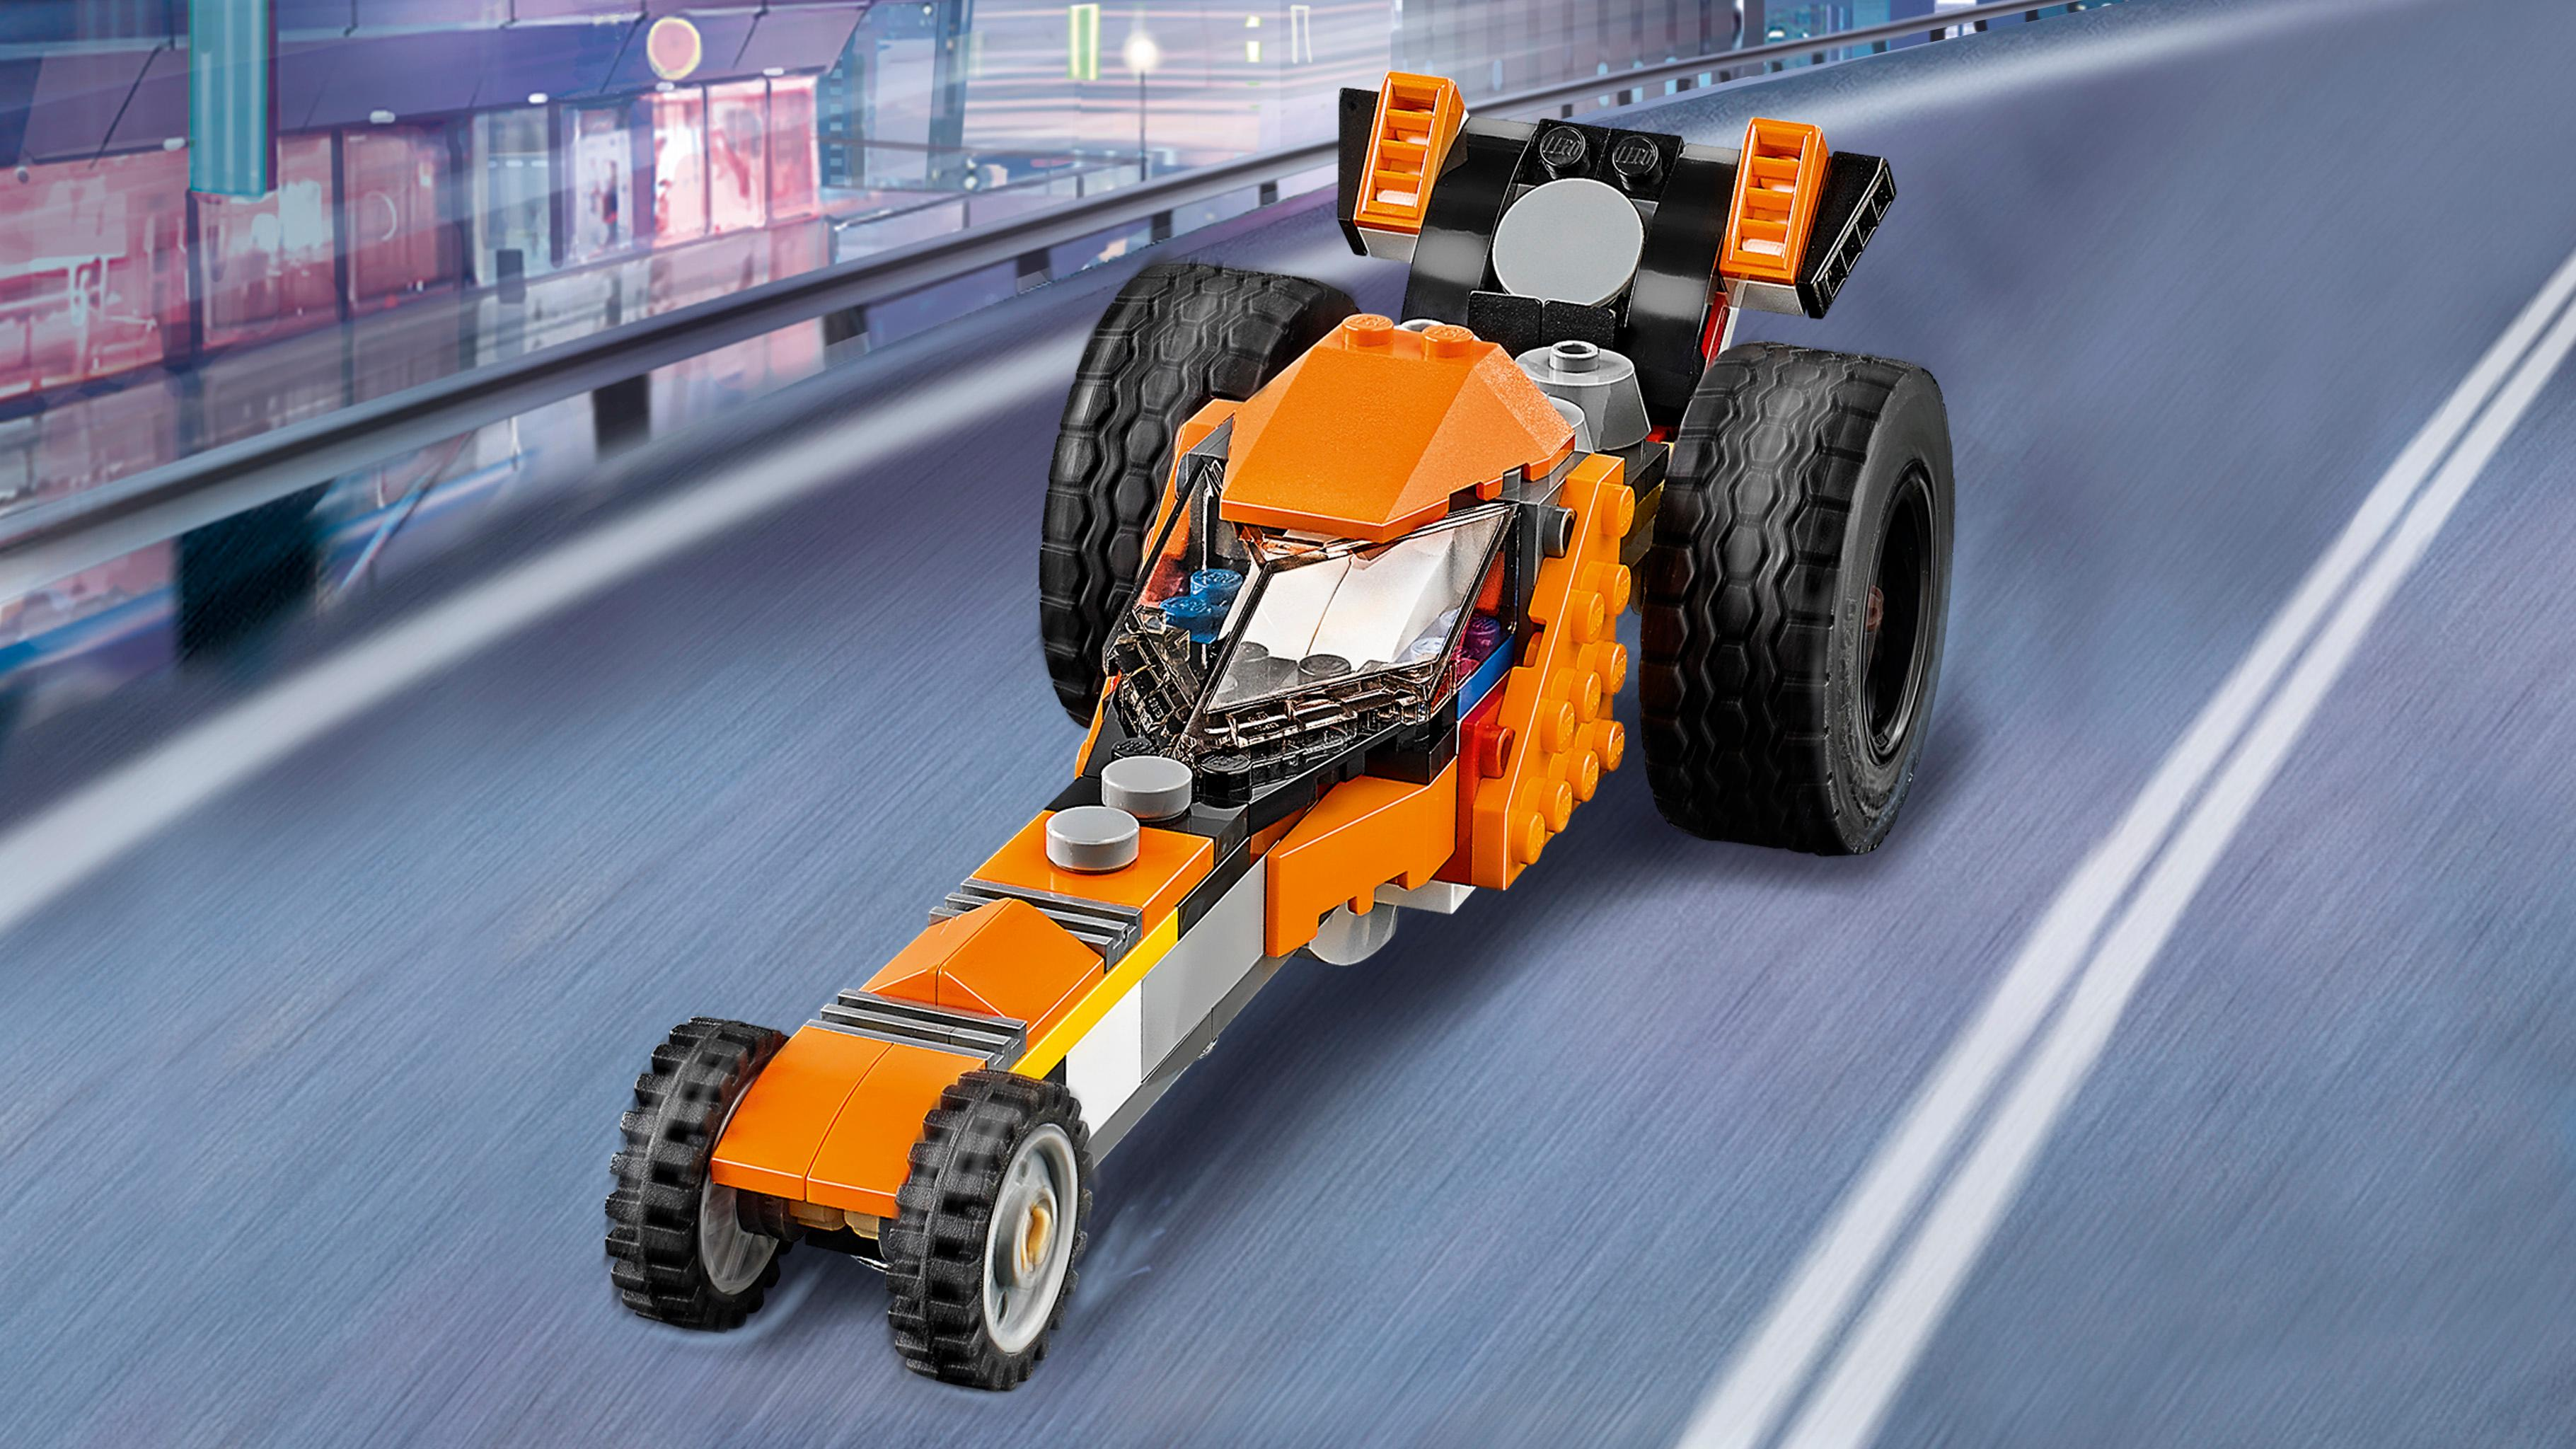 amazoncom lego creator sunset street bike  building toy toys games